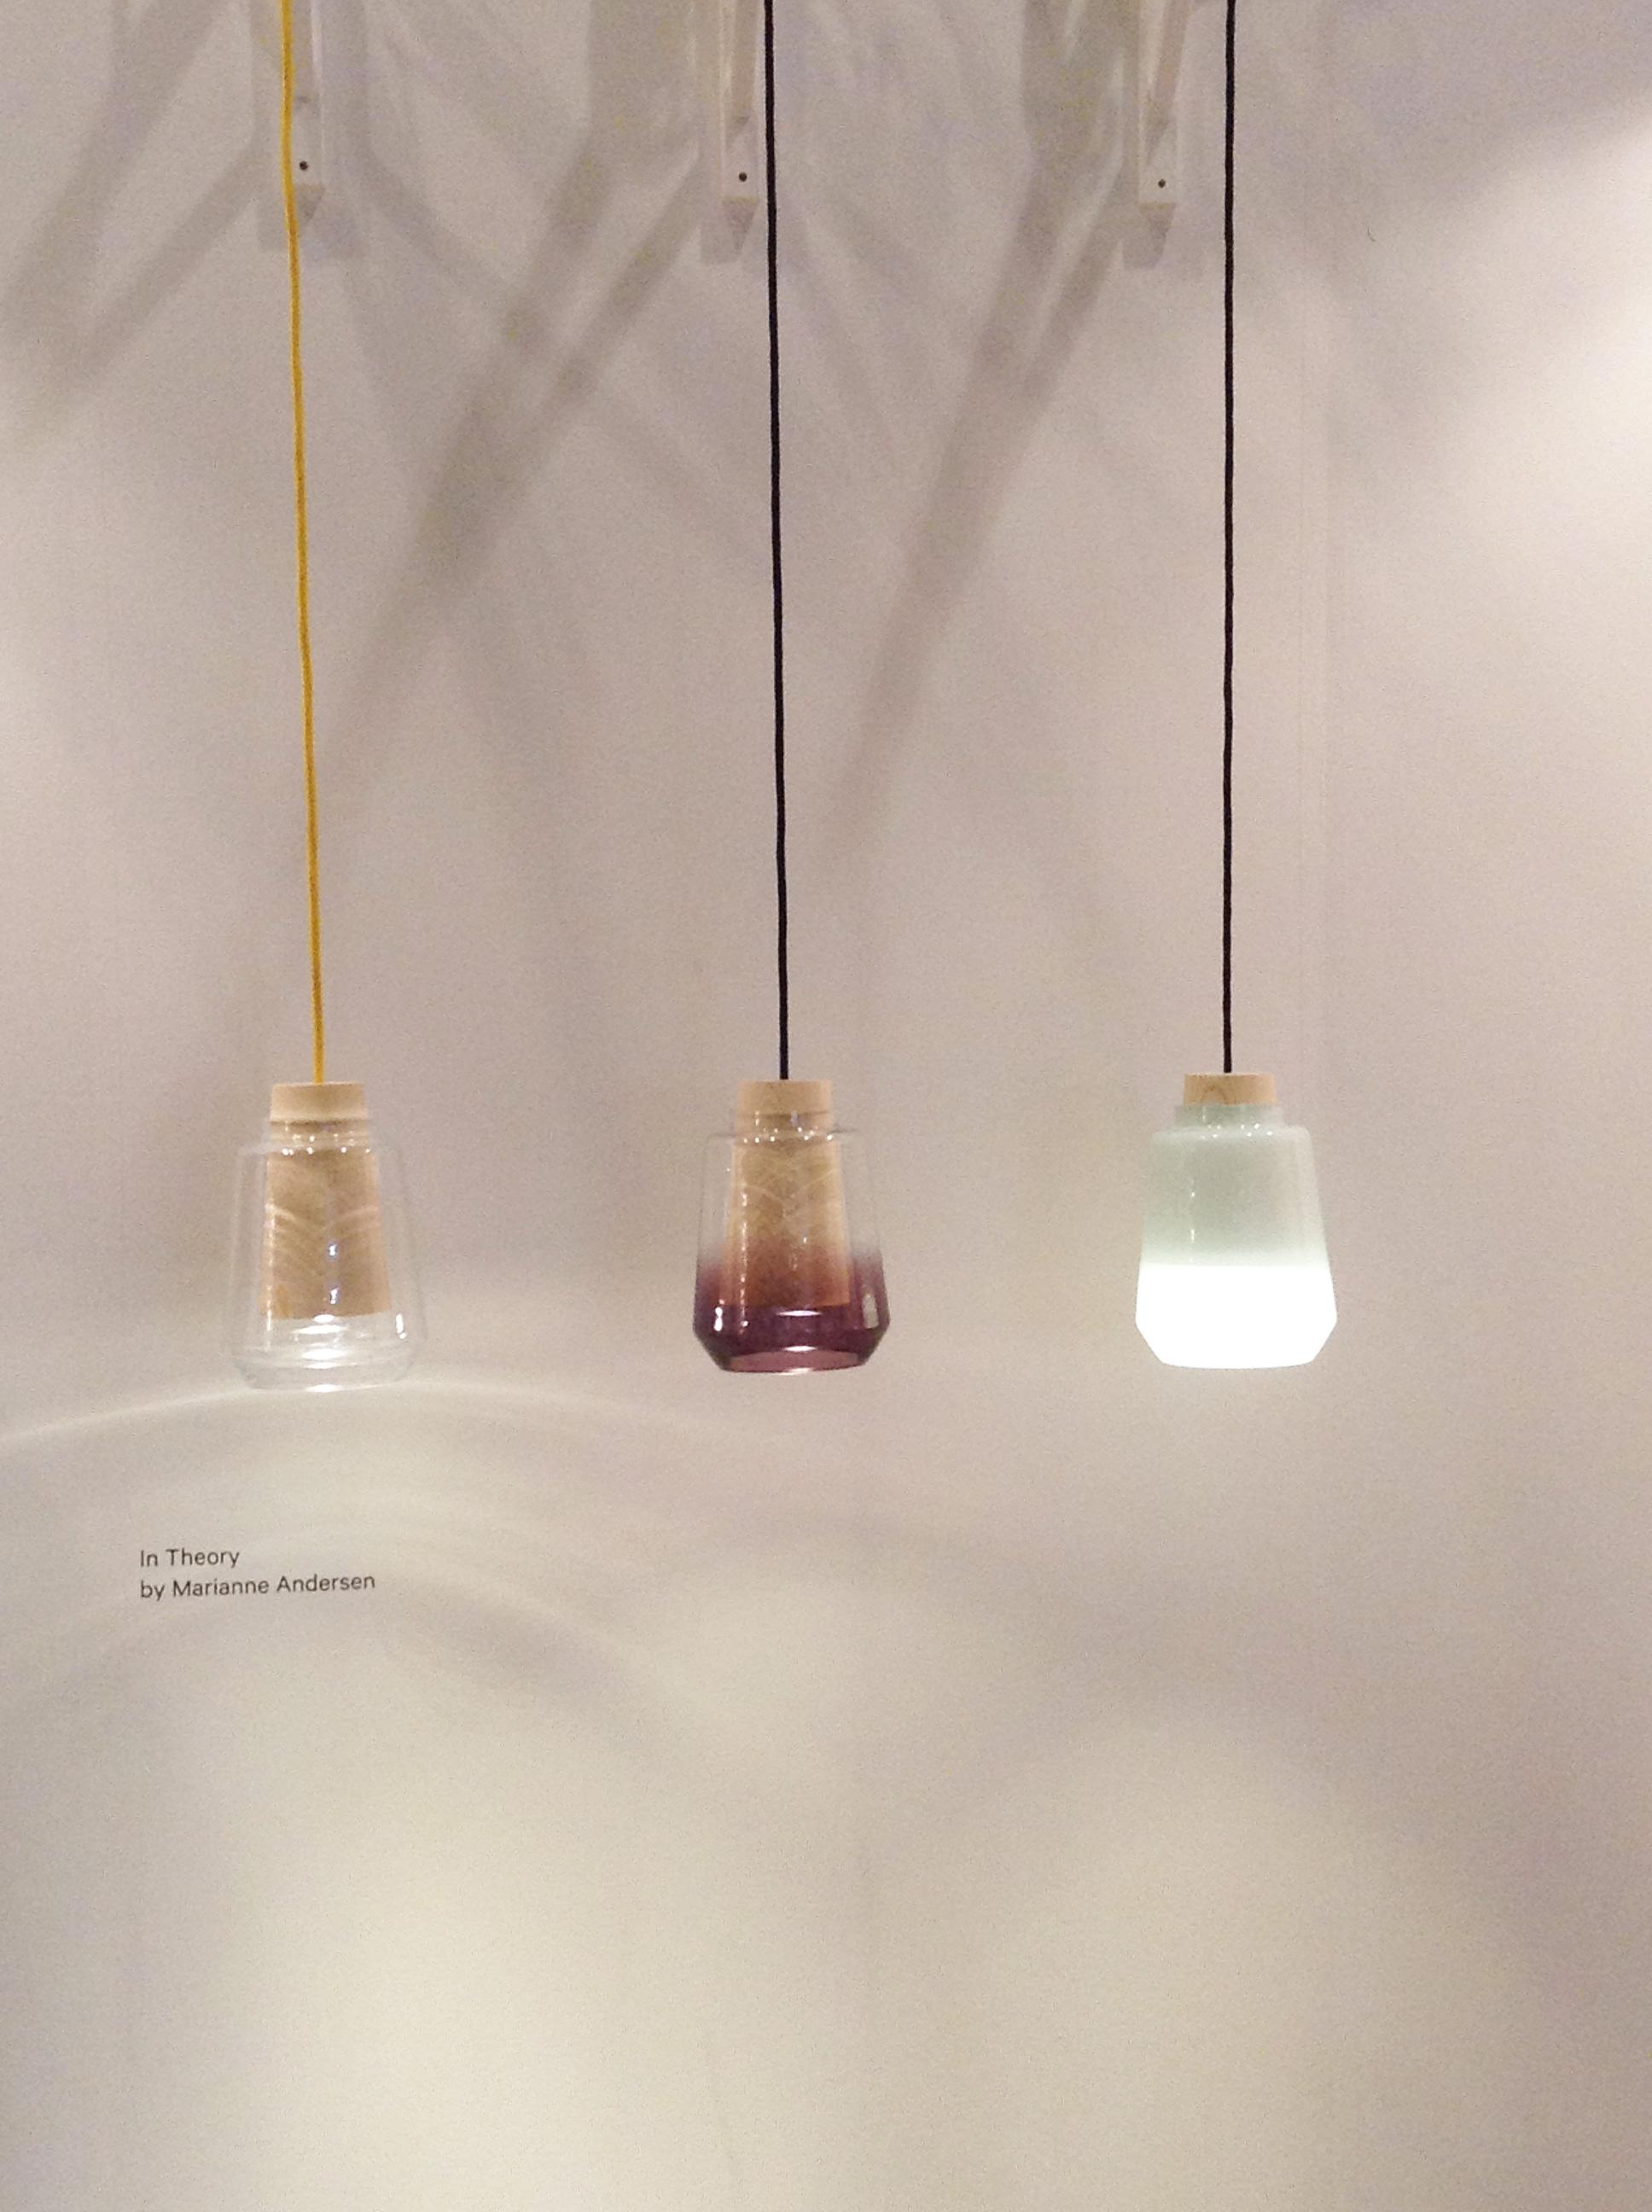 Stockholm Furniture Fair-Light